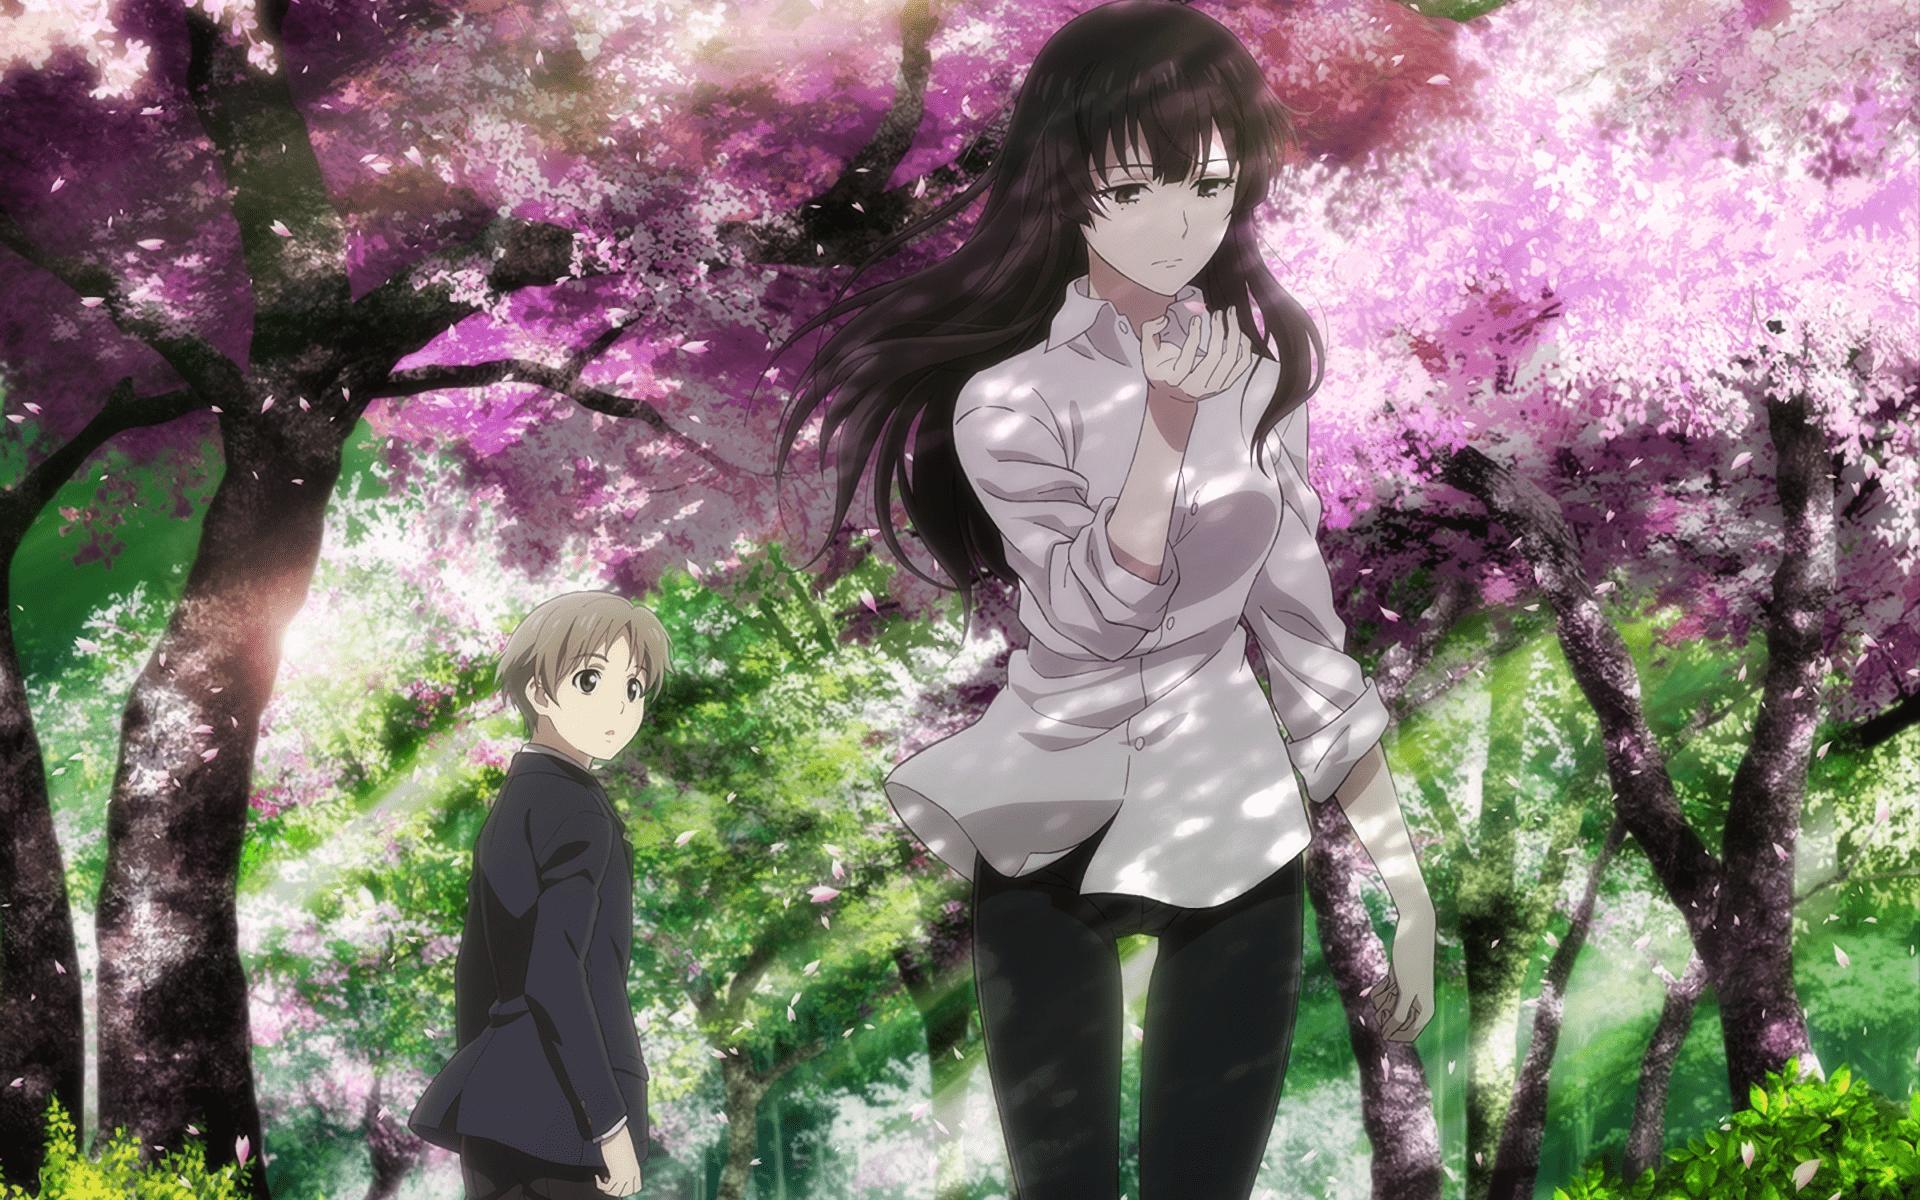 Mystery anime Beautiful Bones -Sakurako's Investigation- Similar to The Detective Is Already Dead